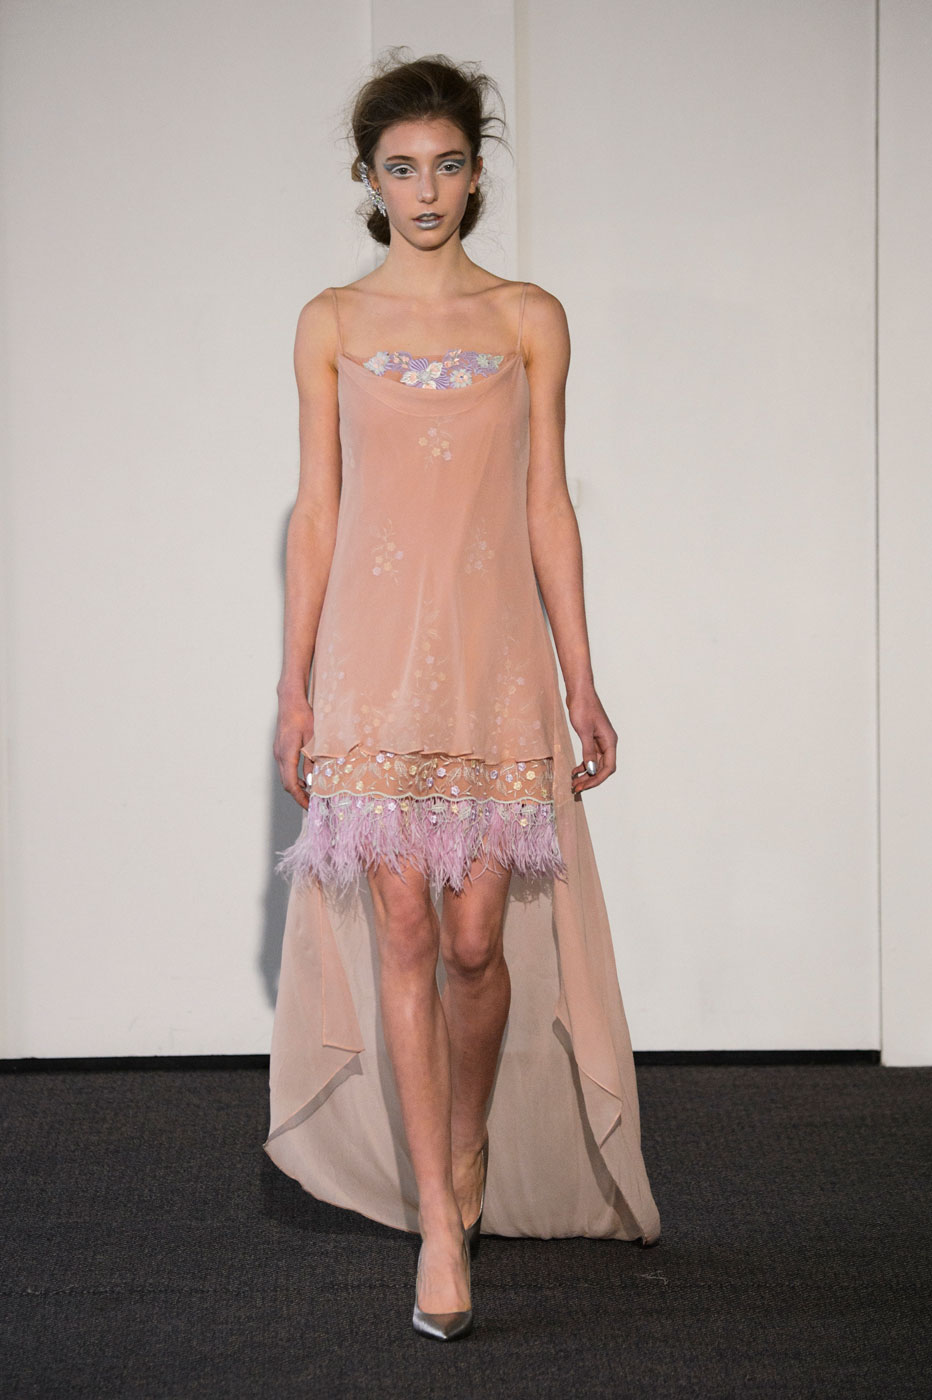 Busardi-fashion-runway-show-haute-couture-paris-spring-2015-the-impression-31